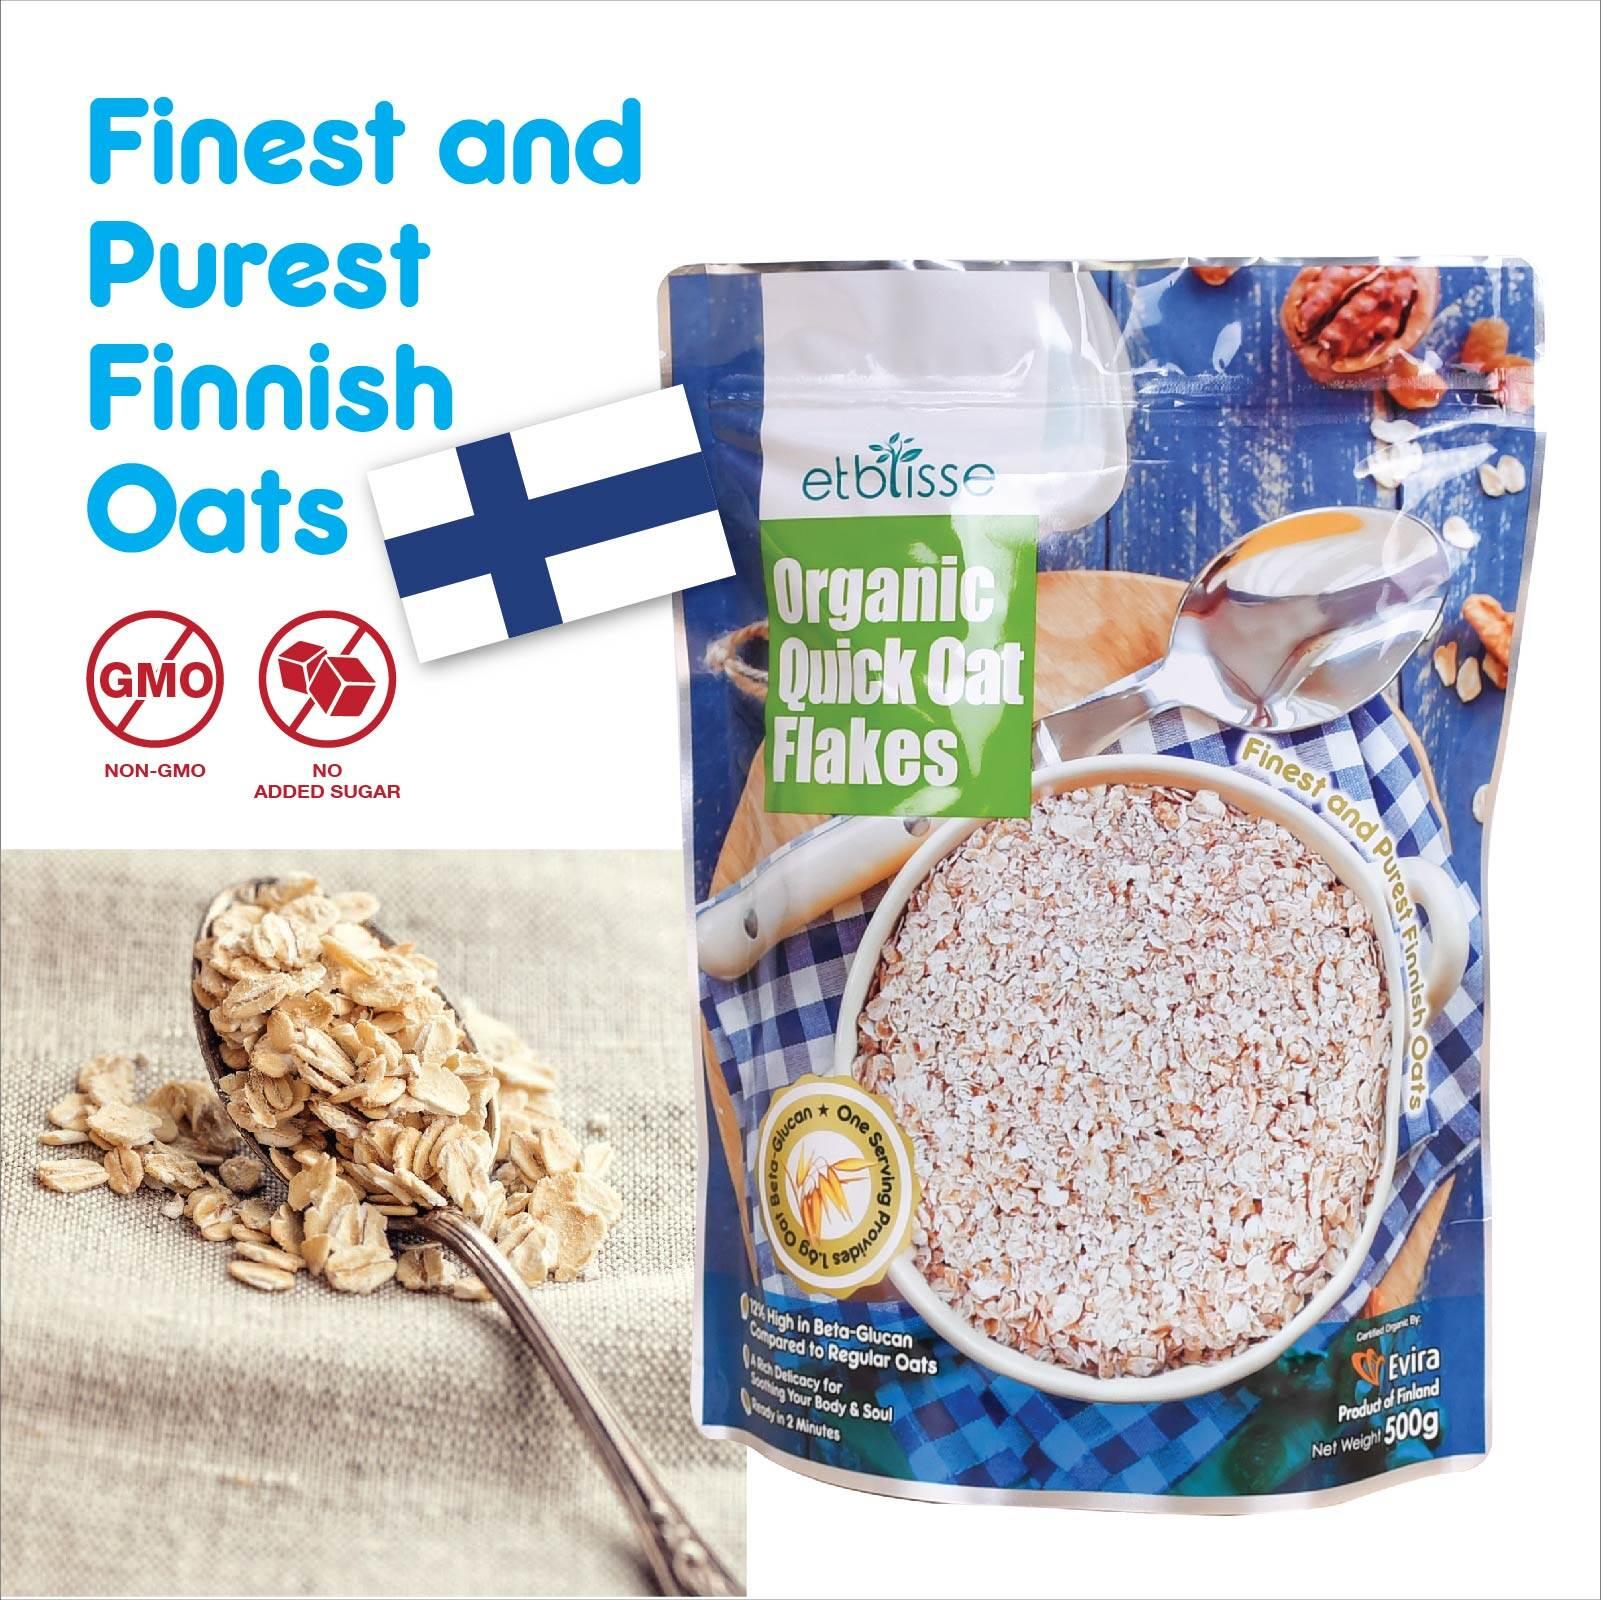 Etblisse Organic Quick Oat Flakes 500g (HALAL)